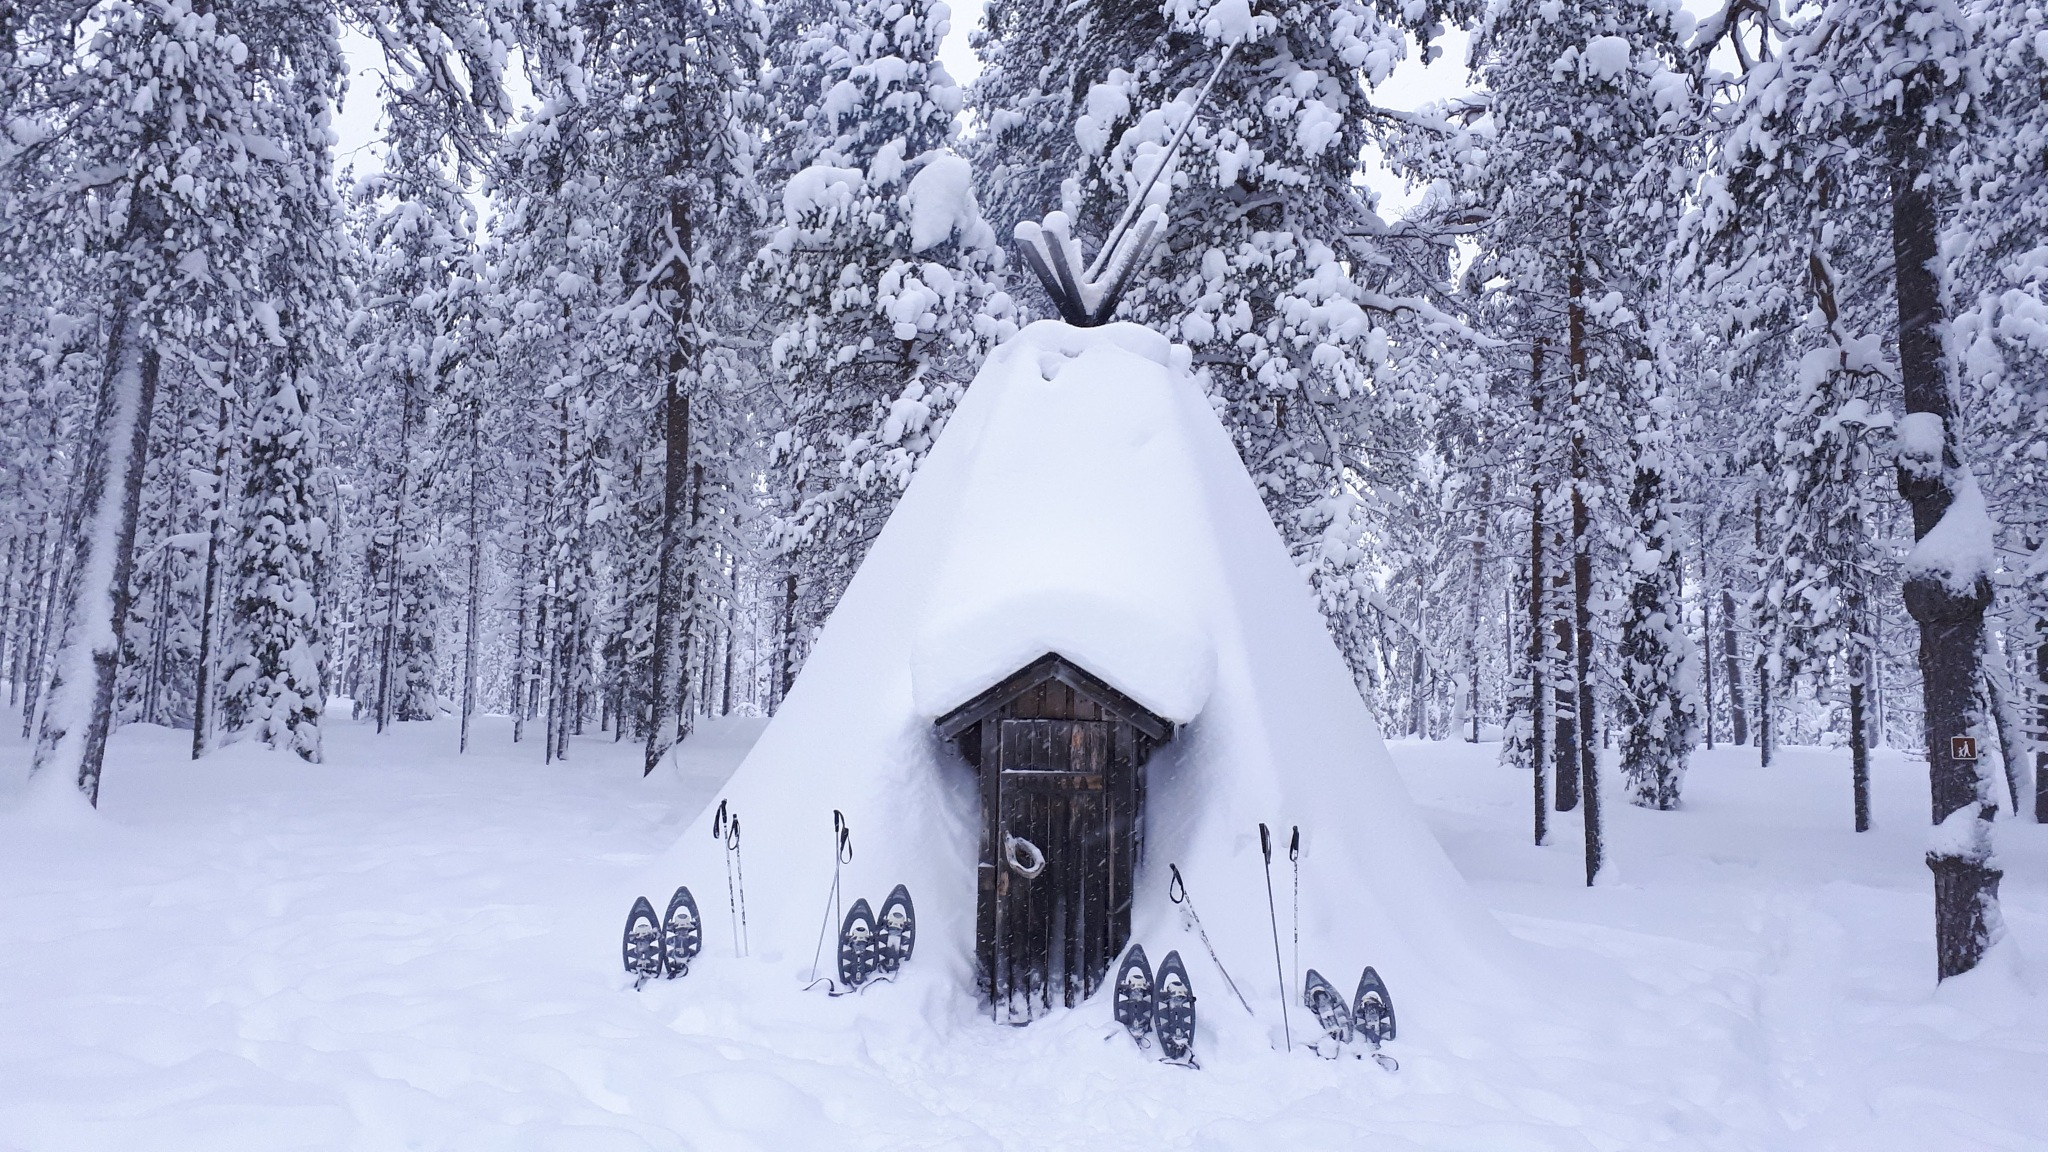 Kota, finland by Judith Entius